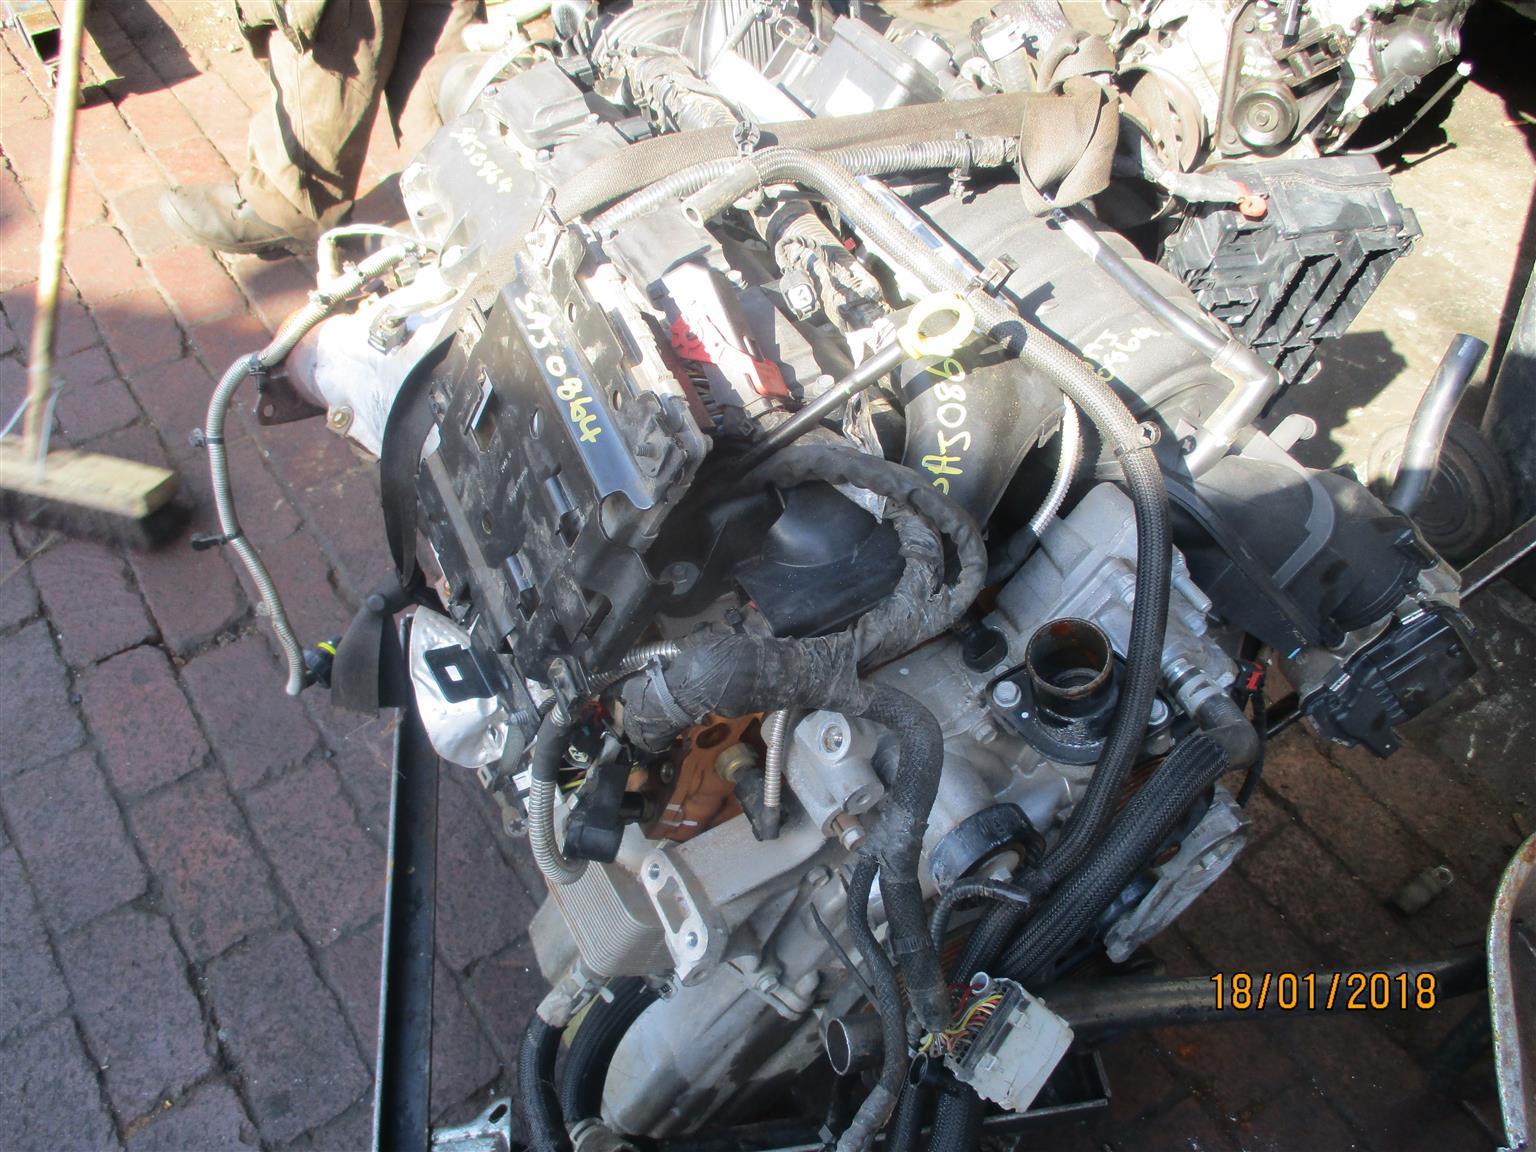 JEEP GRAND CHEROKEE 6.4 SRT8 2014 ENGINE